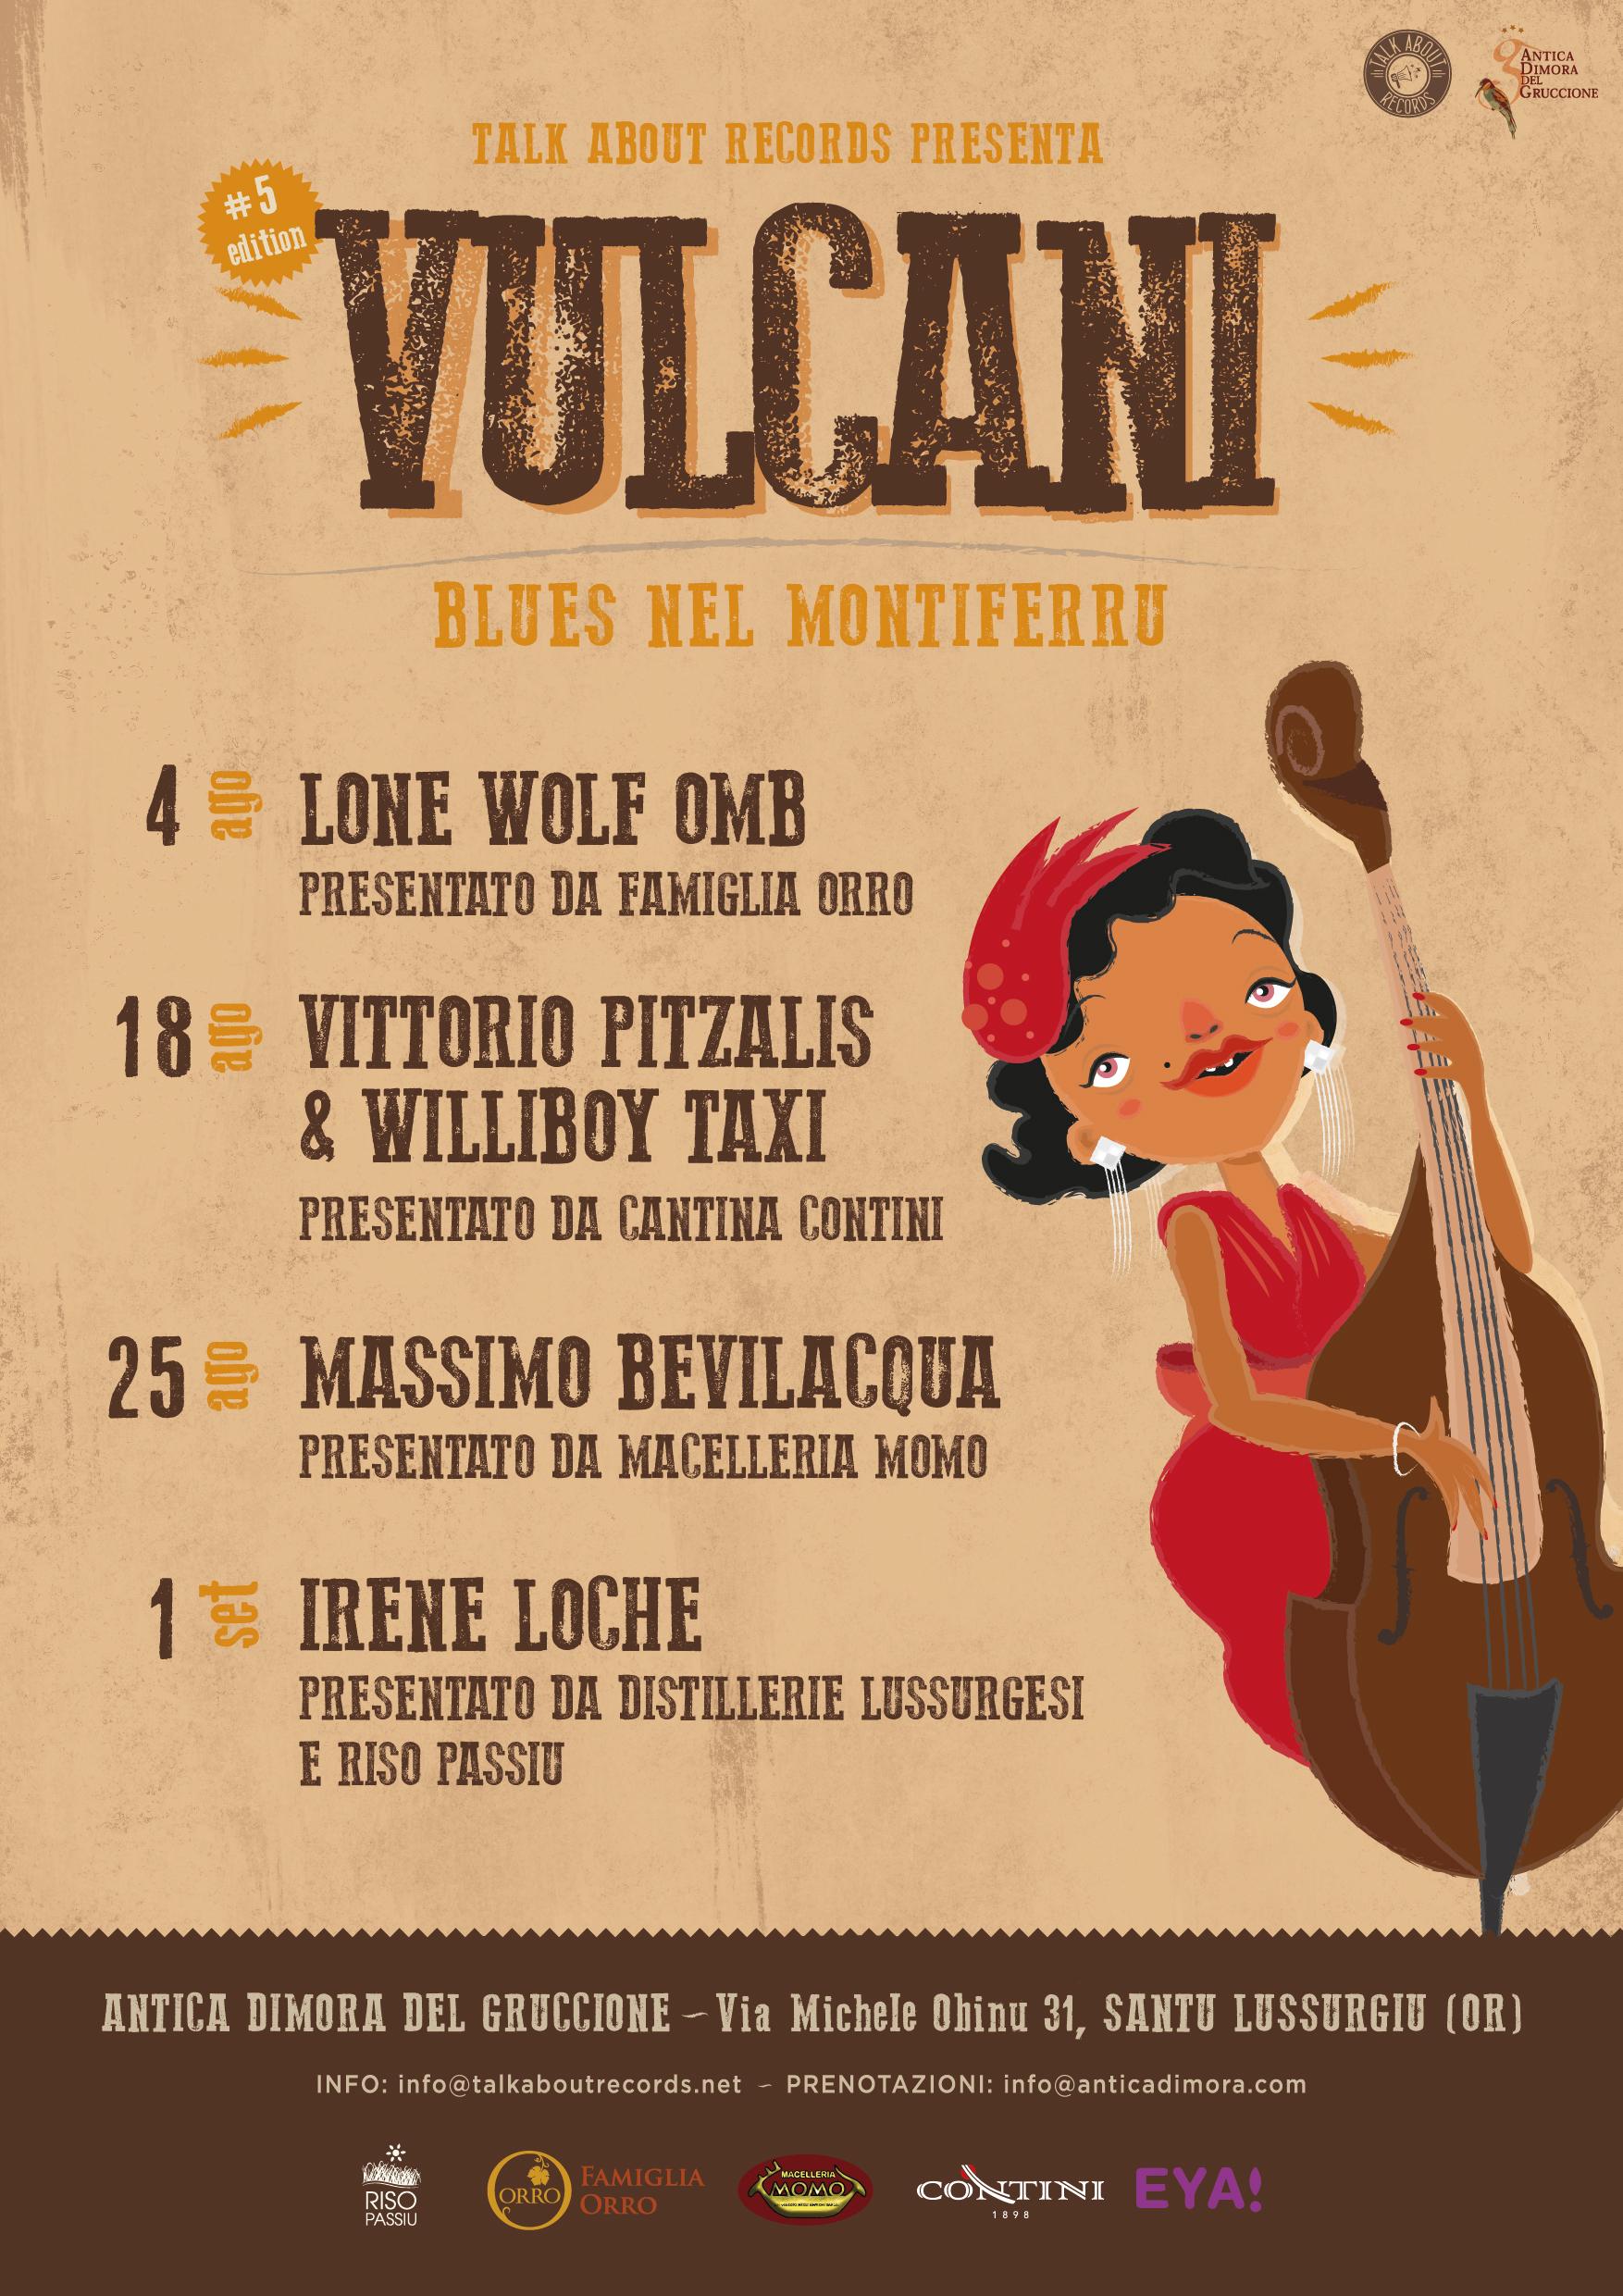 poster vulcani 2018